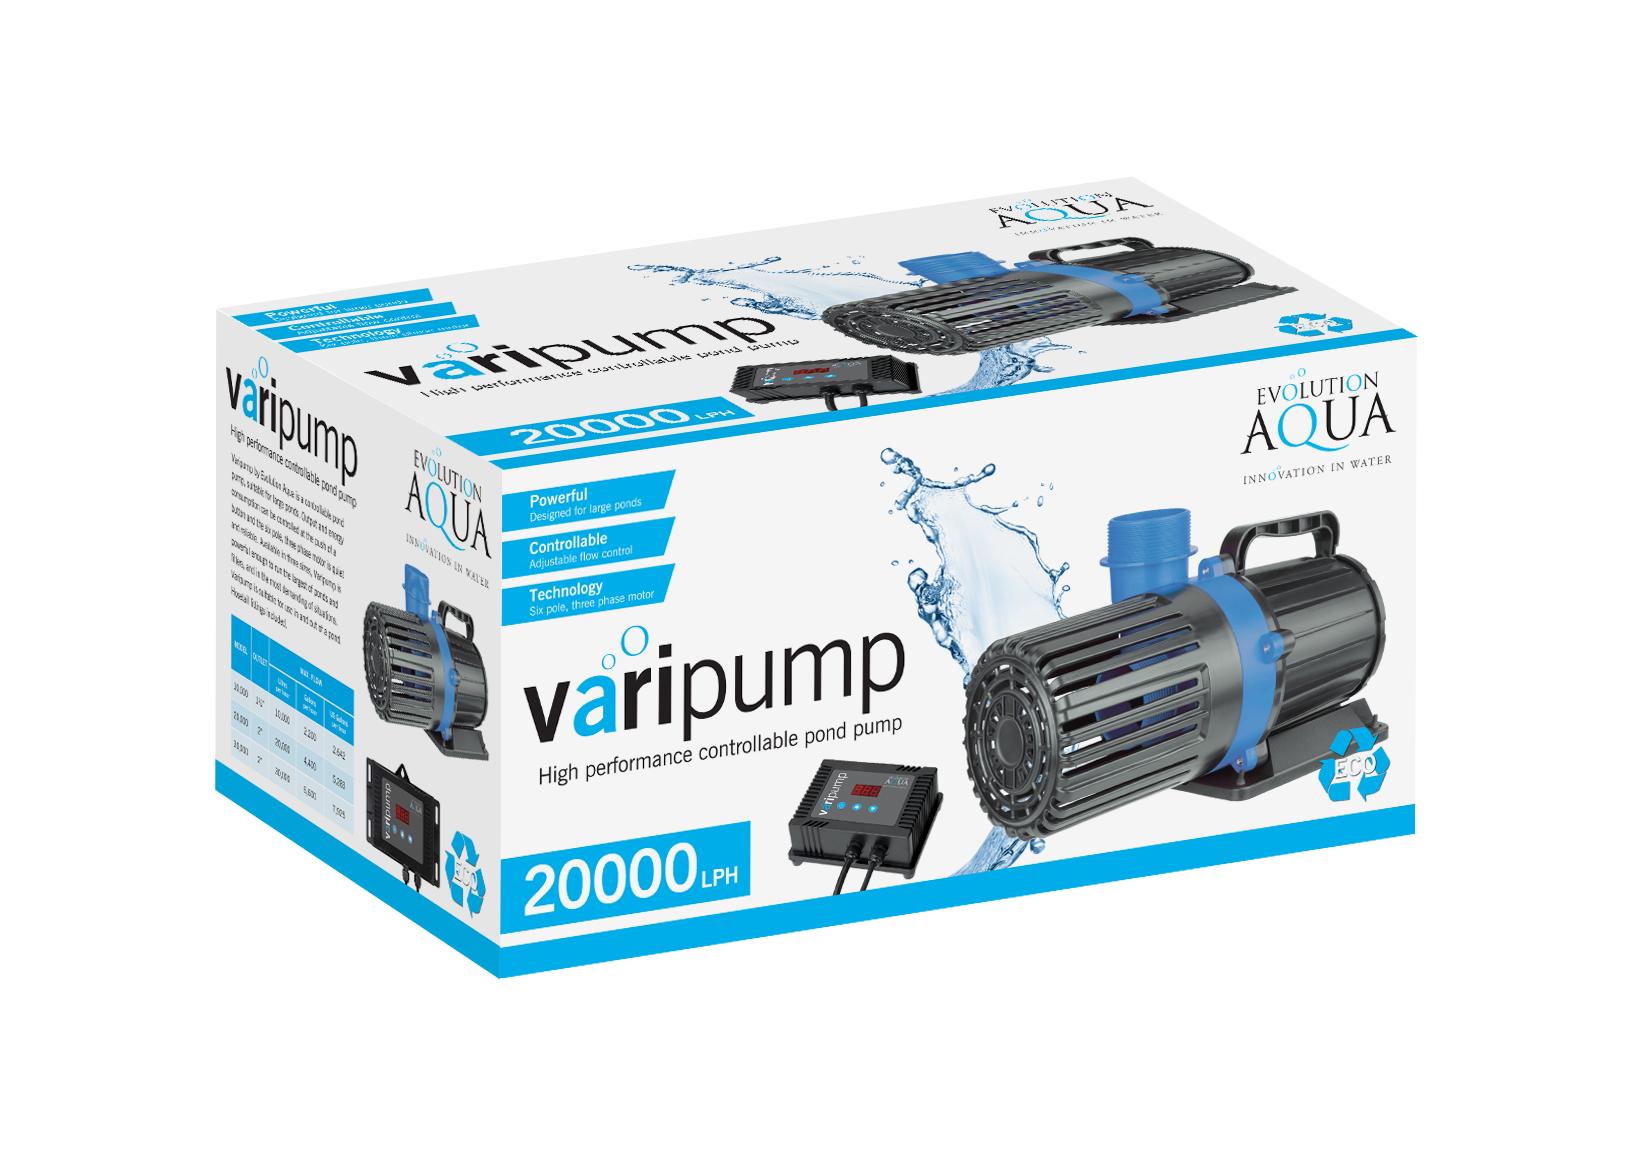 Evolution Aqua launch new controllable pond pumps